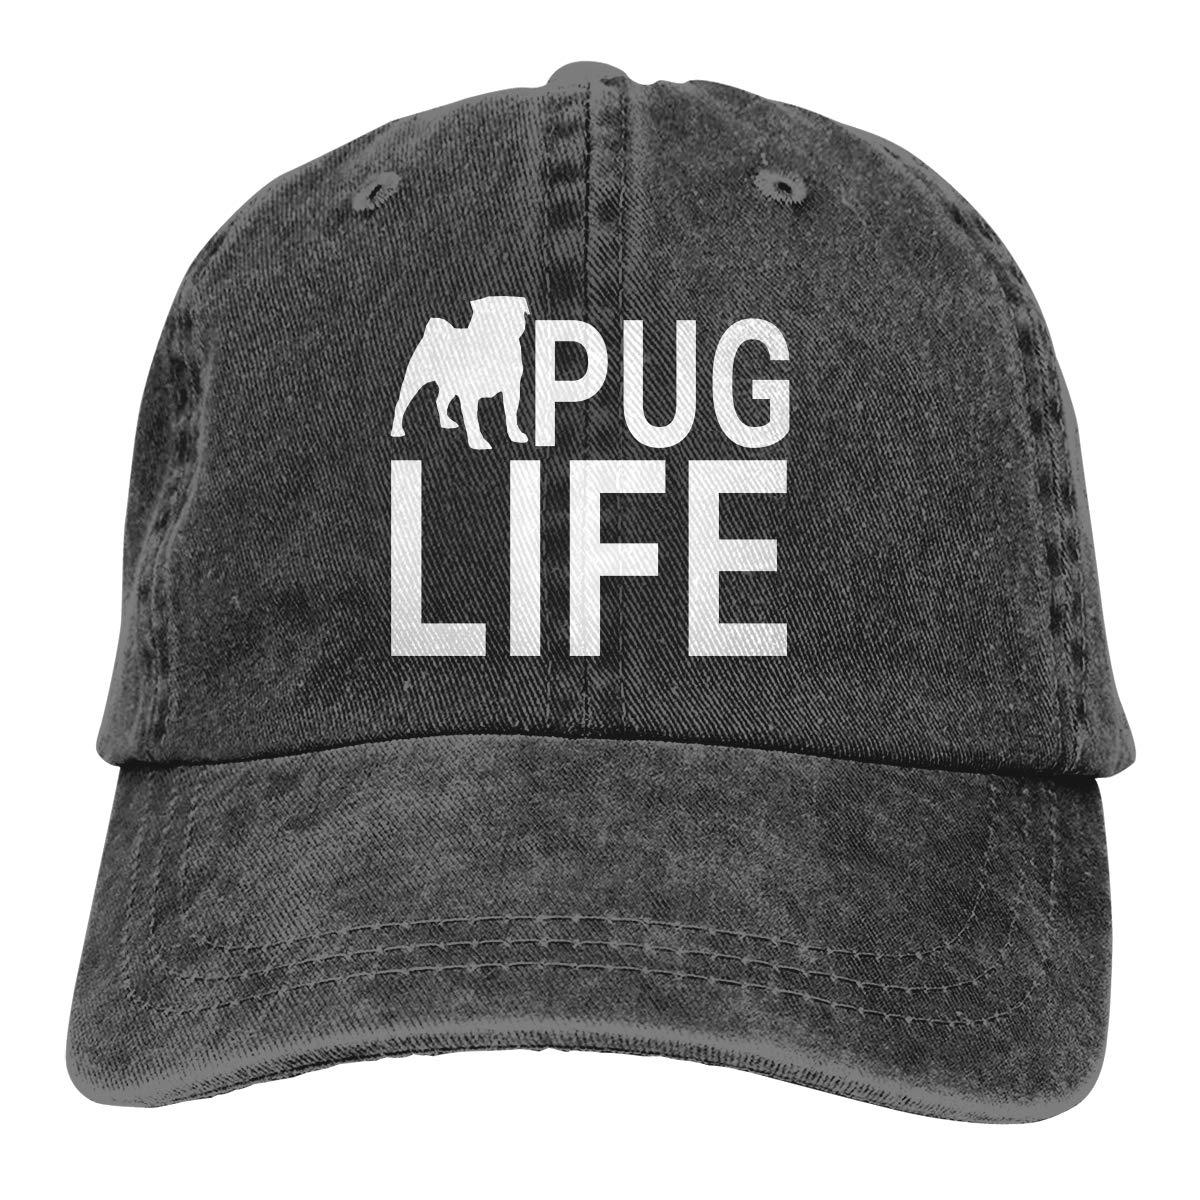 Qbeir Adult Unisex Cowboy Cap Adjustable Hat Pug Life Cotton Denim